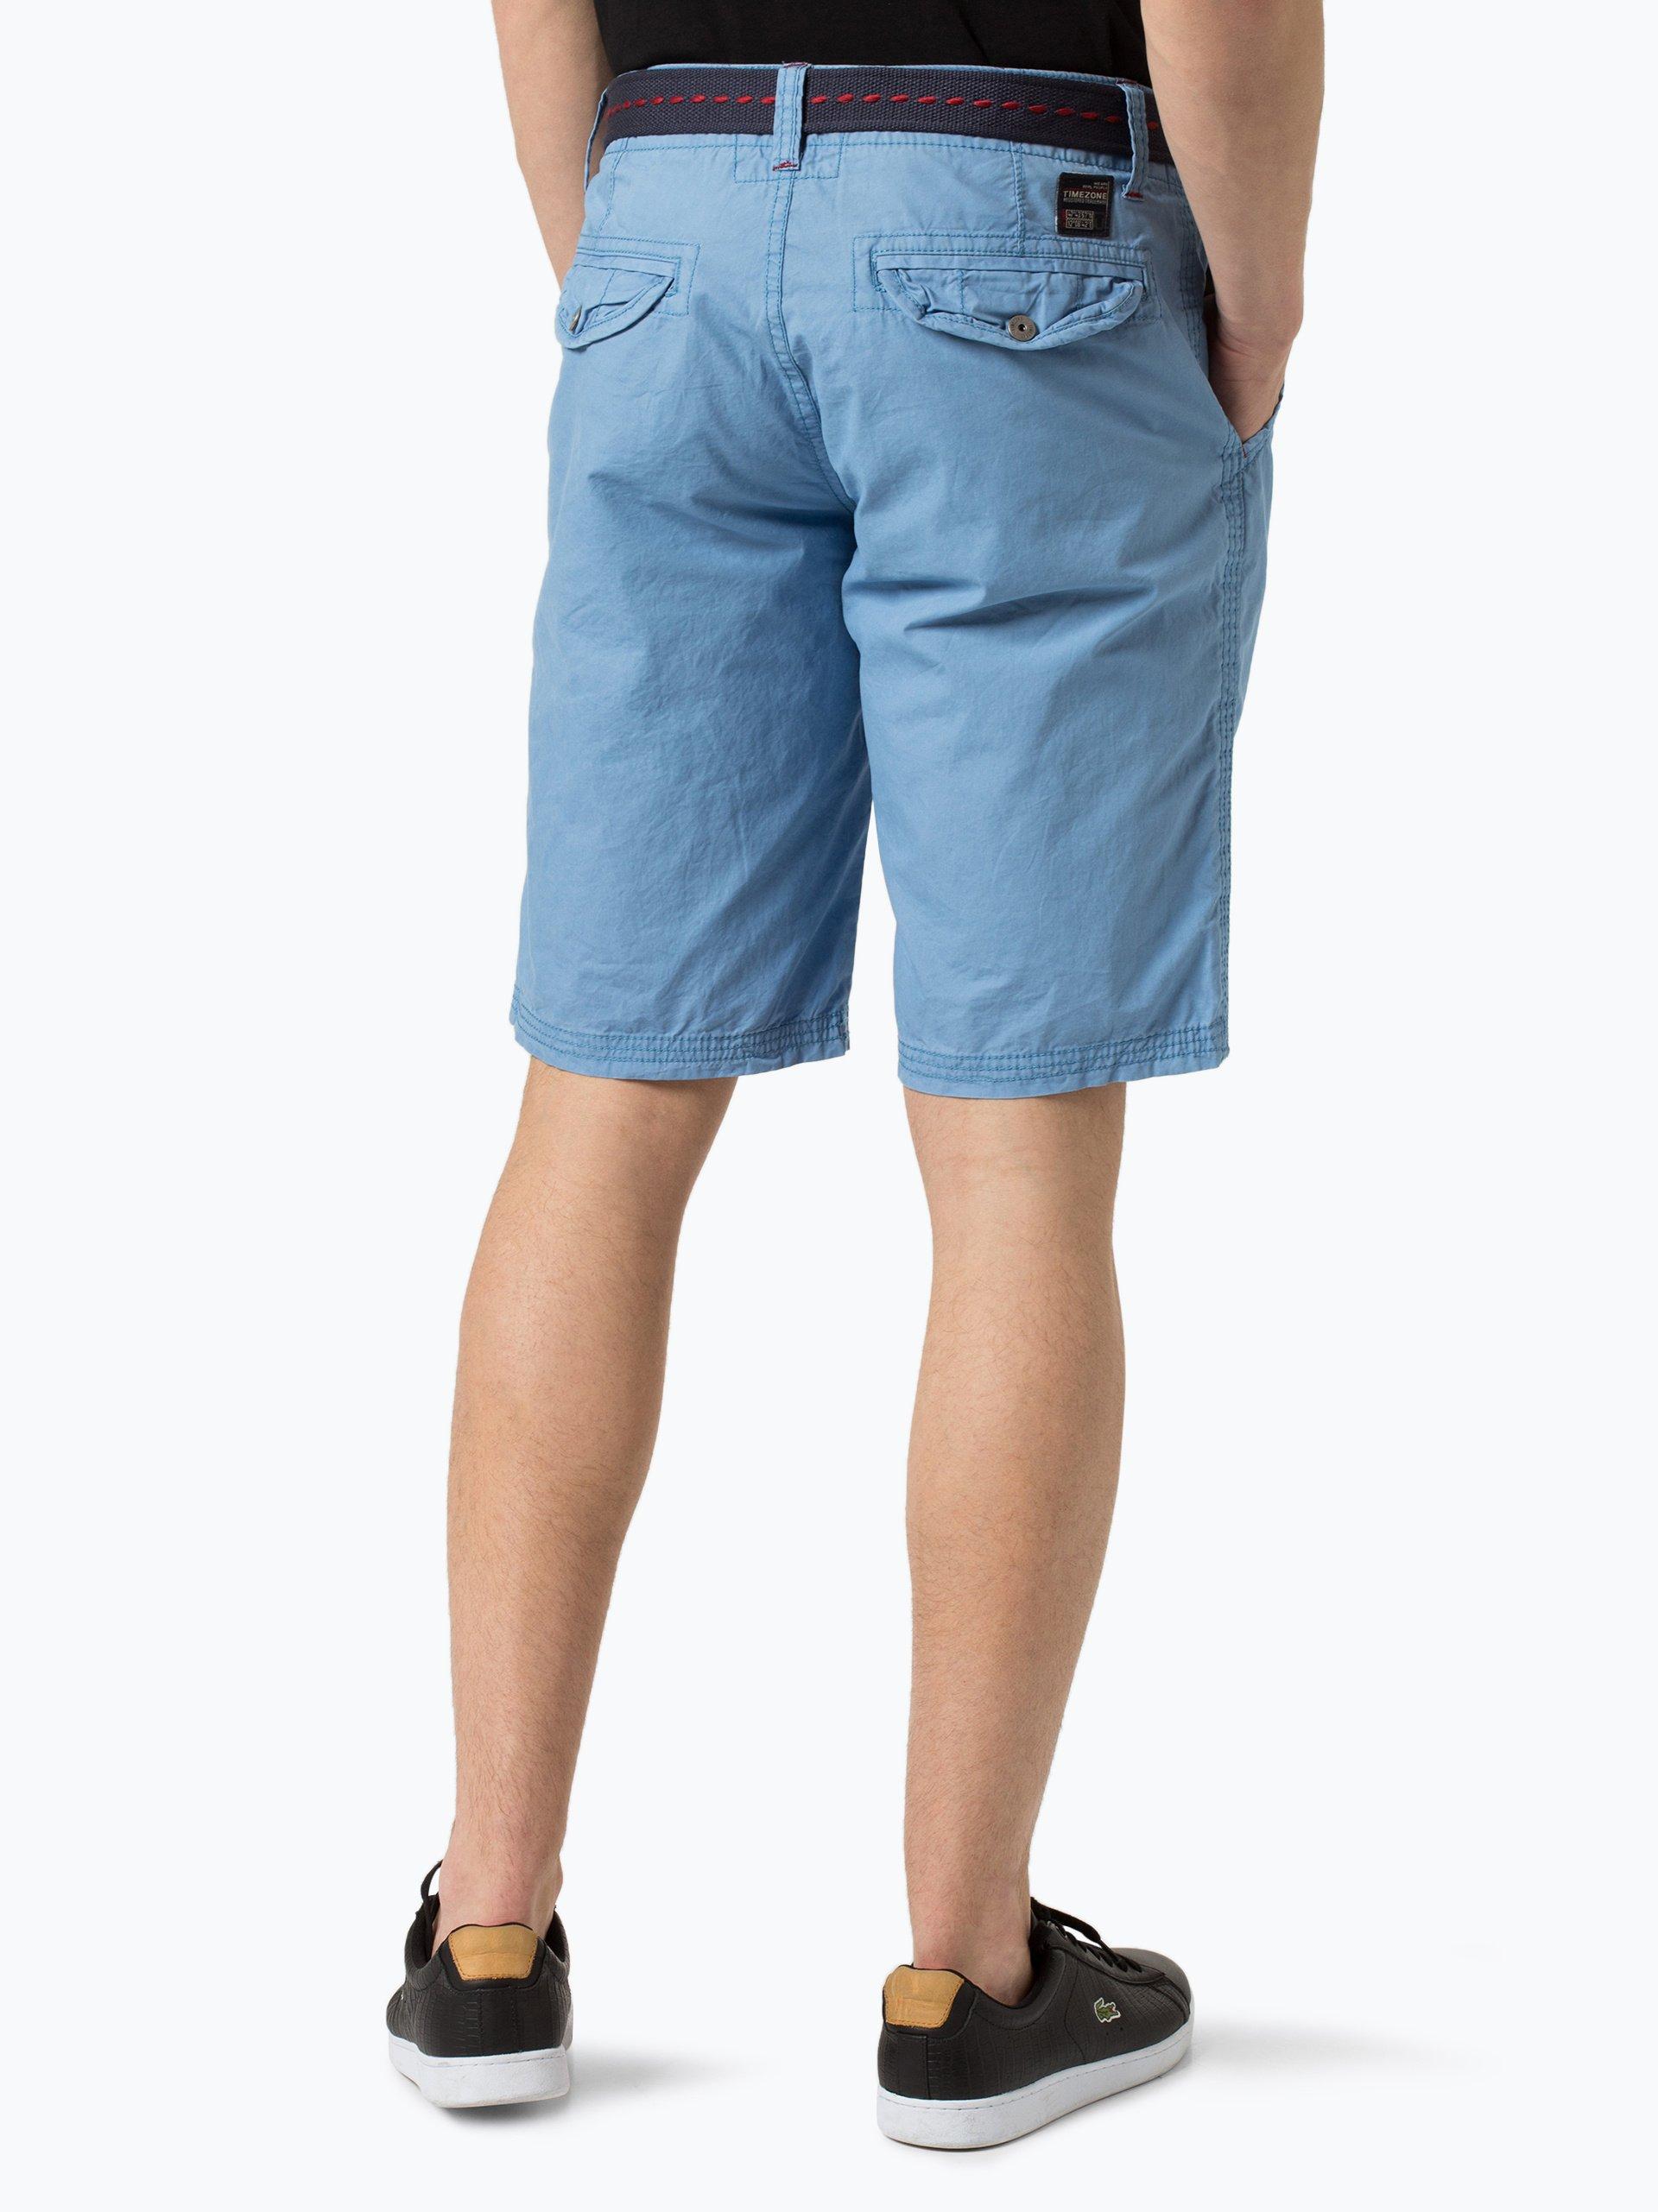 Timezone Herren Shorts - Russell